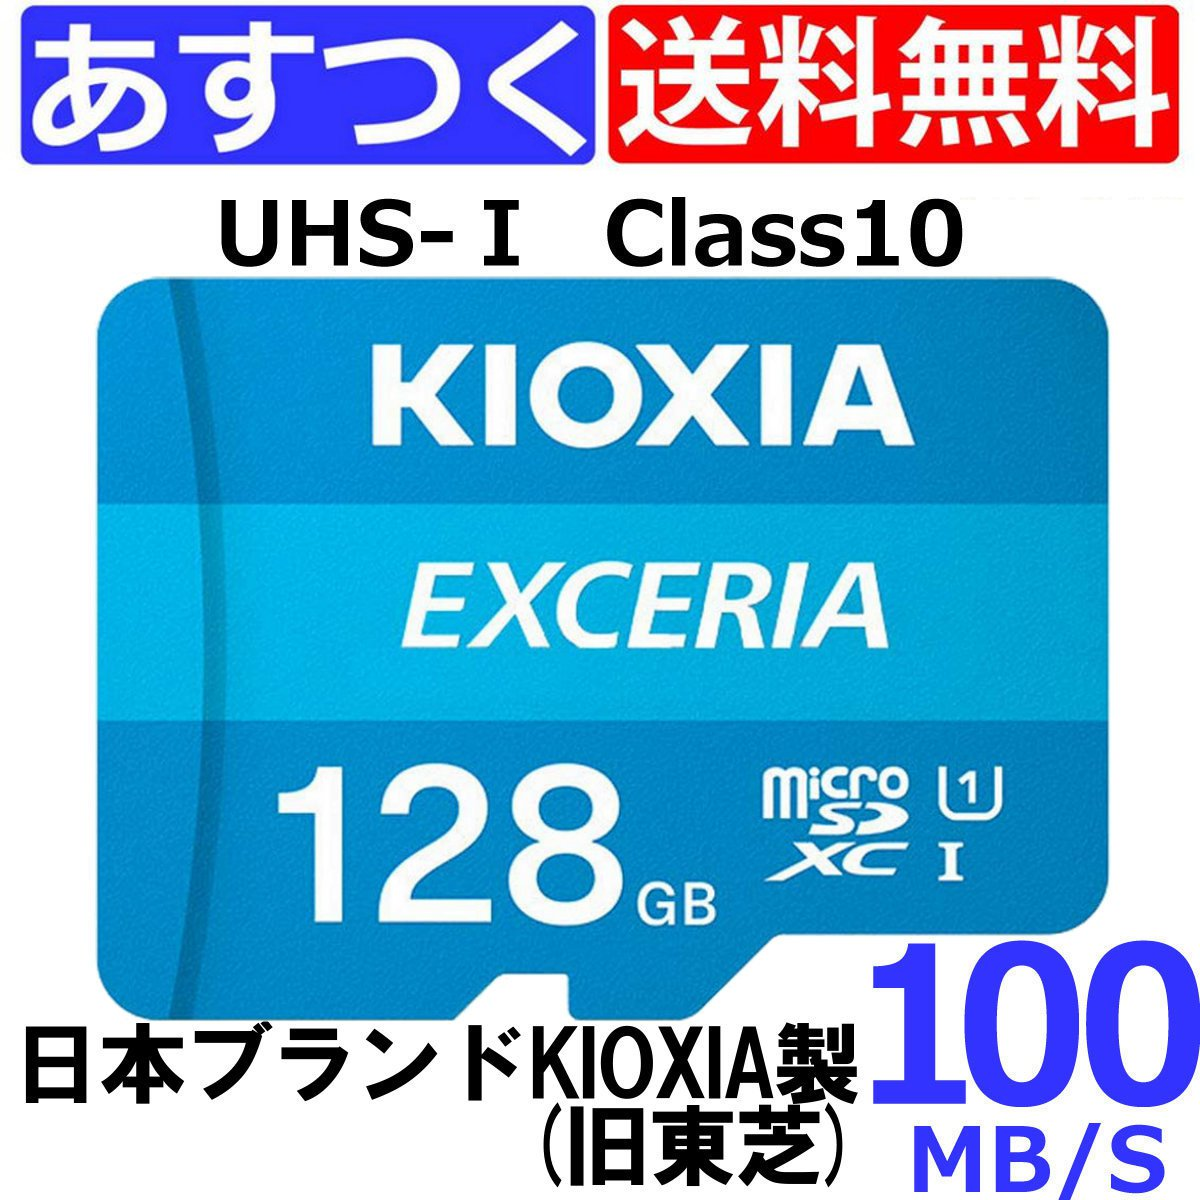 KIOXIA EXCERIA LMEX1L128GG4 (128GB)の商品画像|ナビ